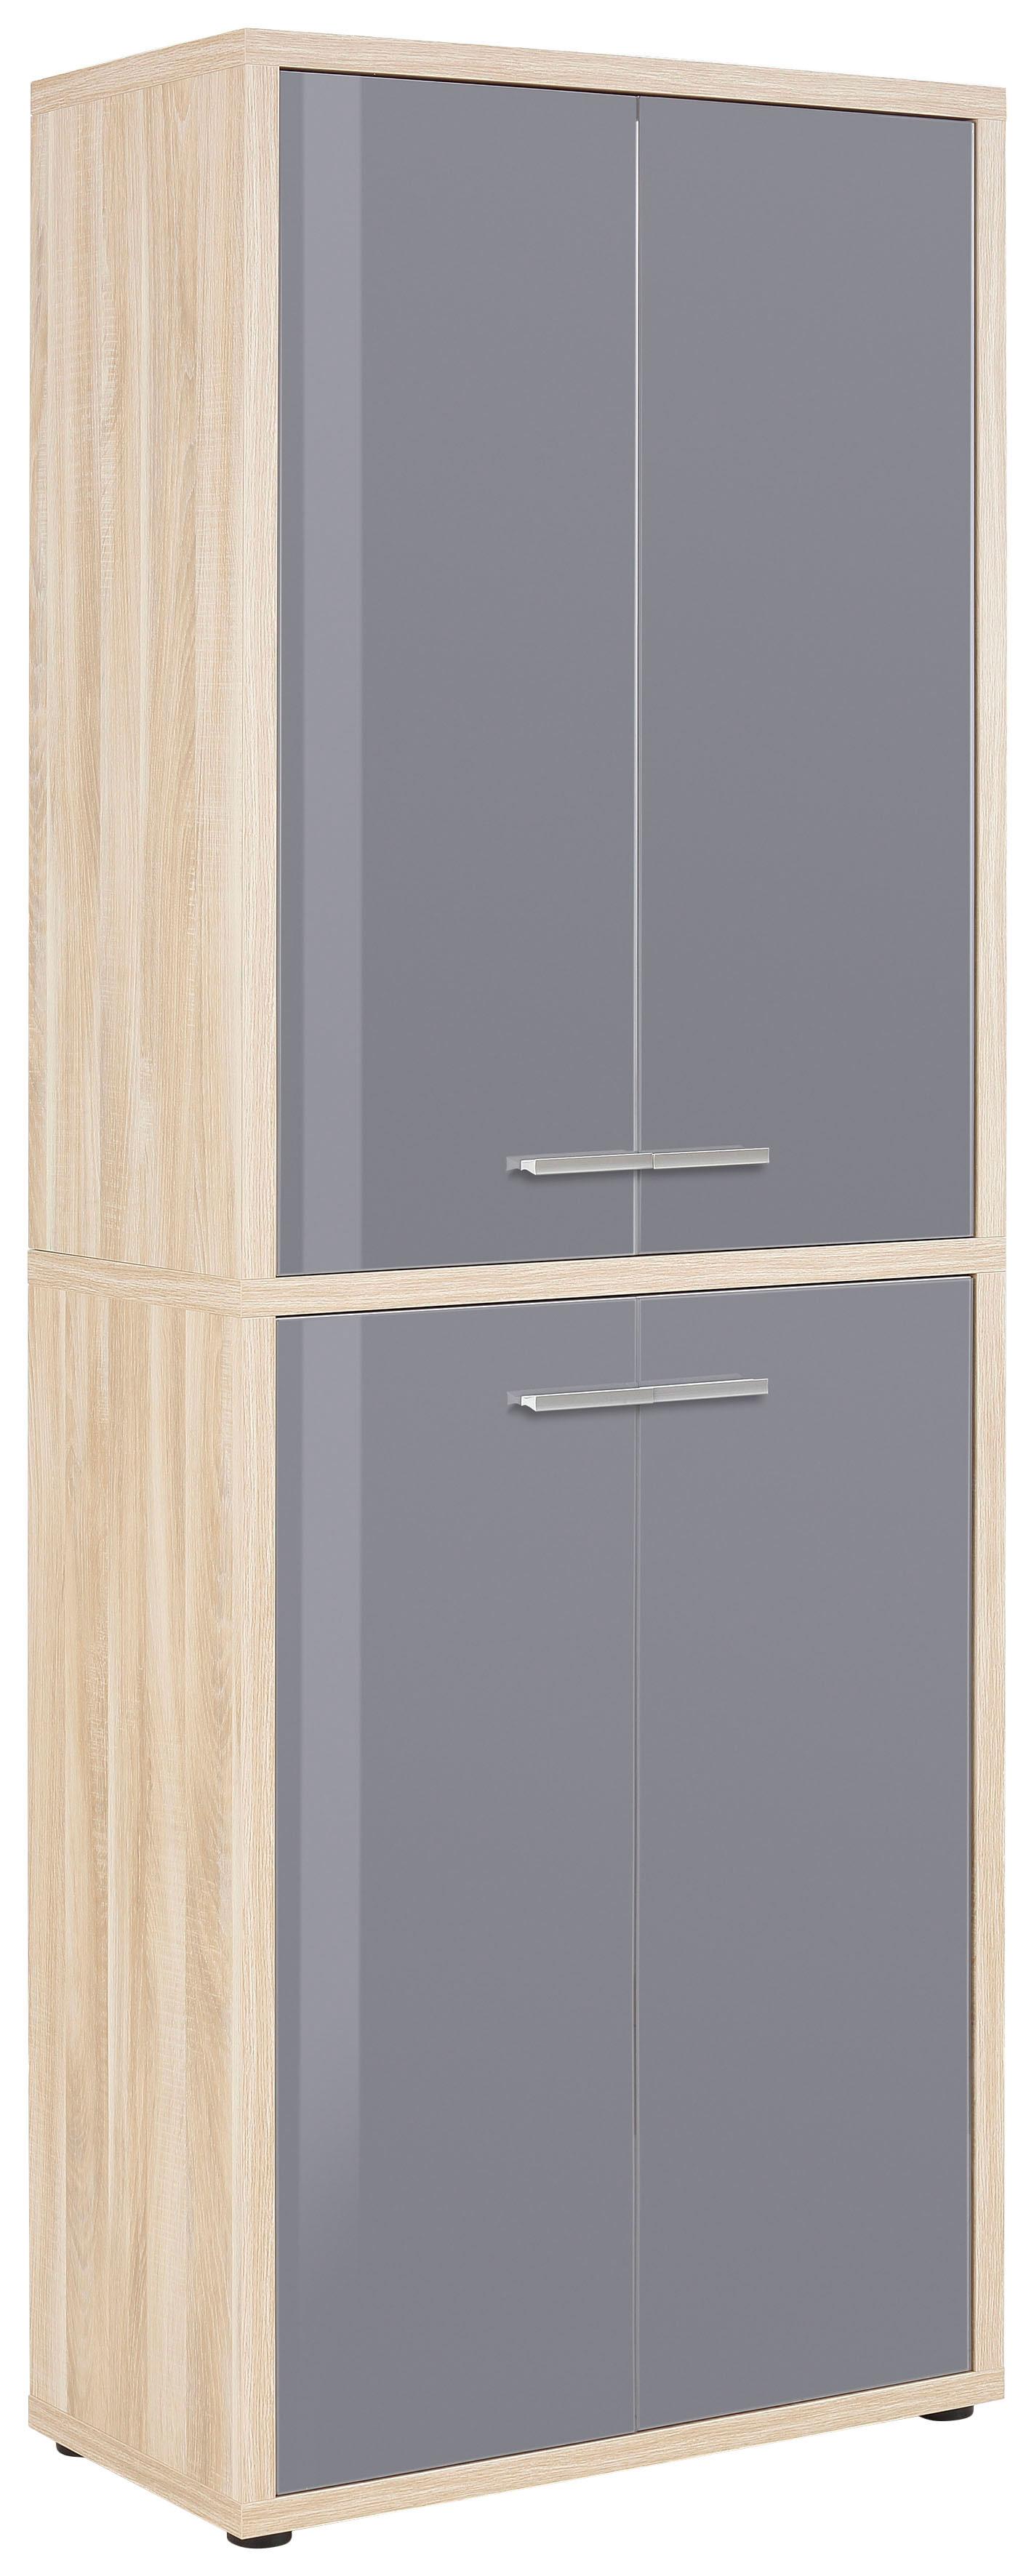 Armoire haute de bureau design chêne naturel/verre gris Damien